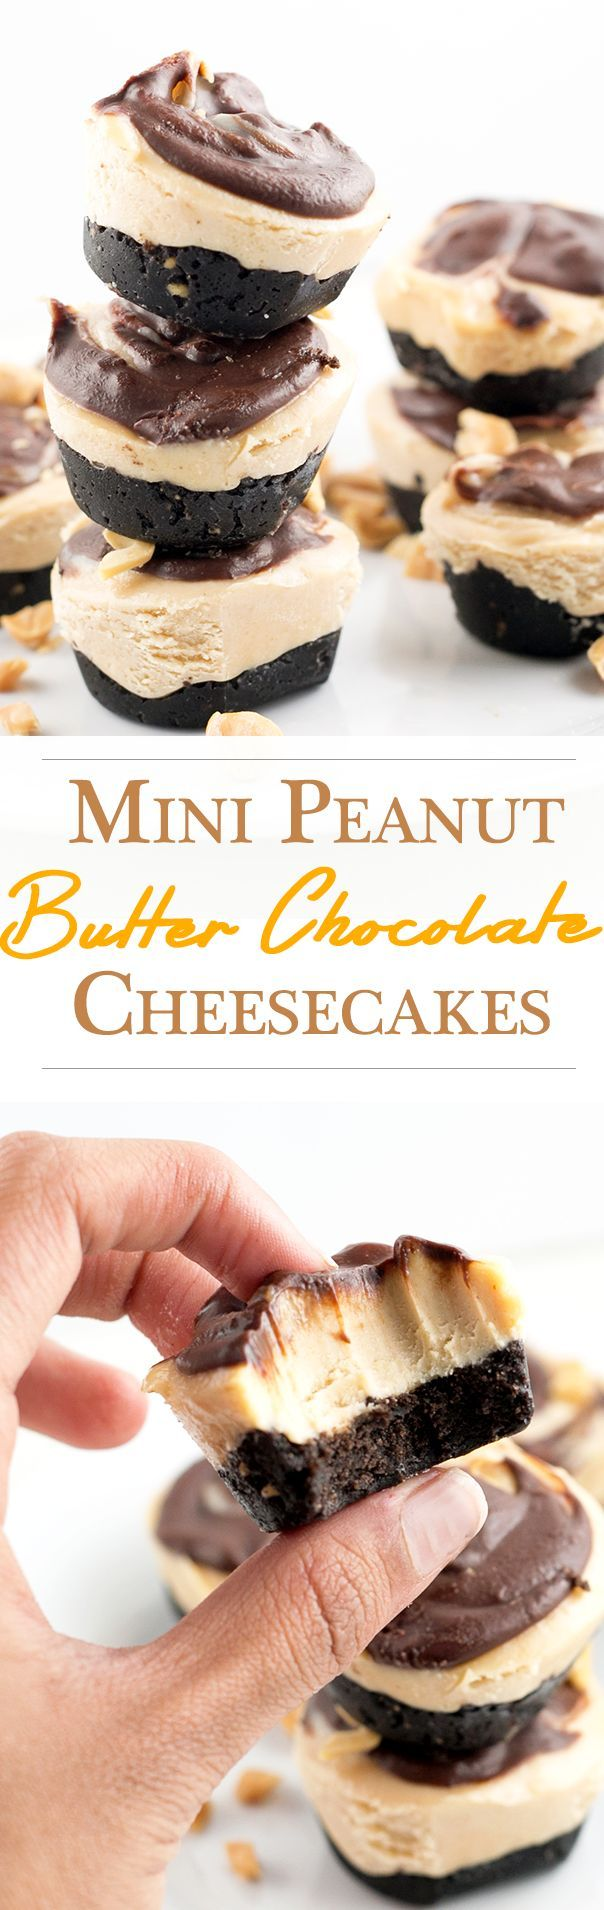 Mini Peanut Butter Cheesecakes With Chocolate Ganache Swirl. VEGAN, Simple, Delicious. #vegan #cheesecake #peanutbutter #foodporn #dessert #recipes